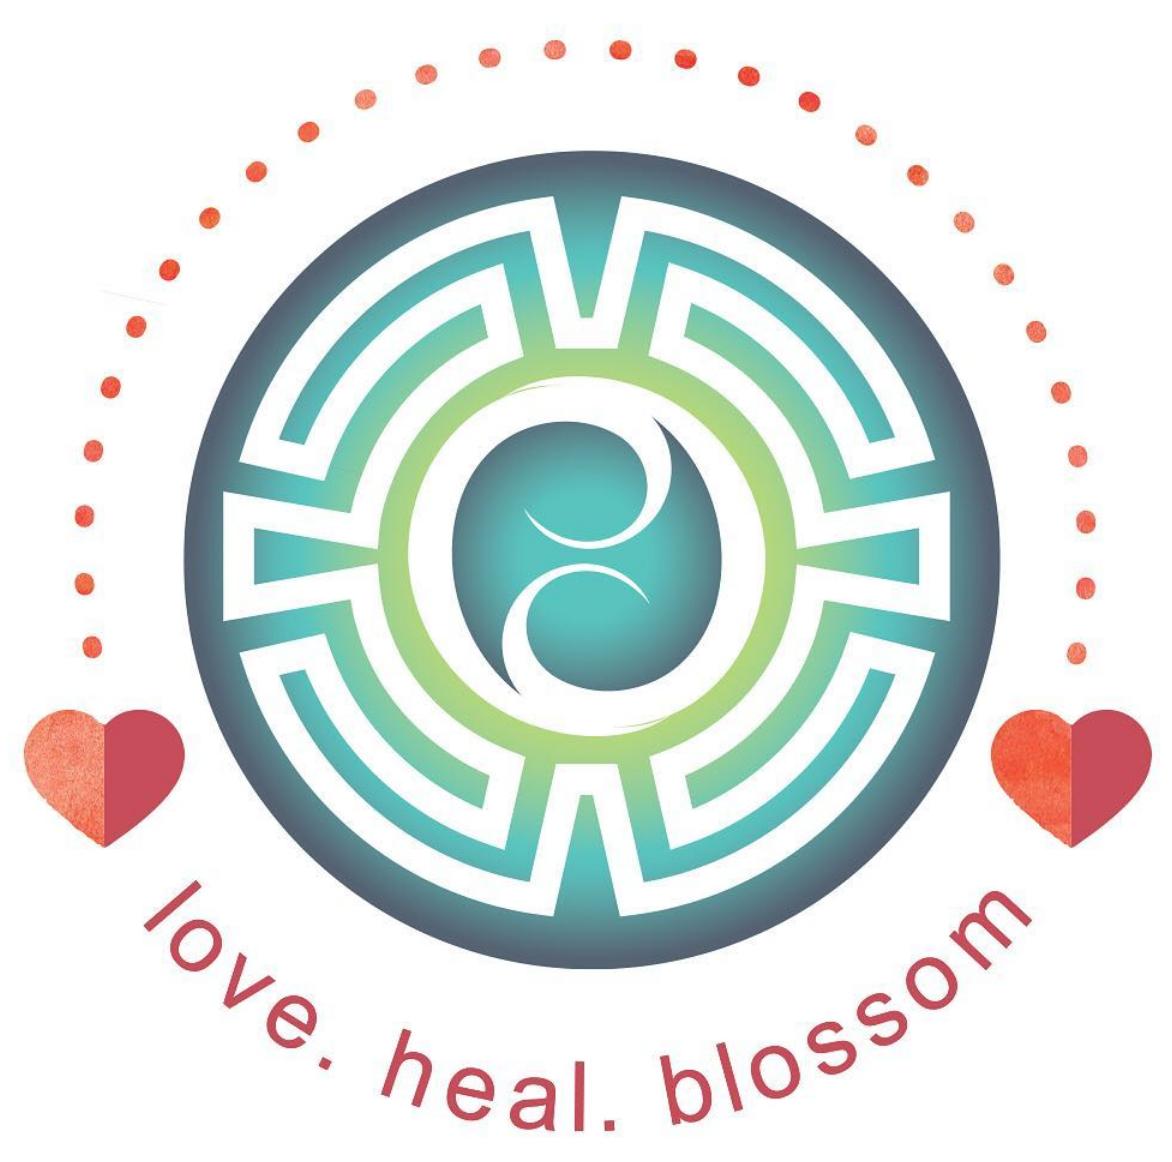 Terry Lynn magical logo design